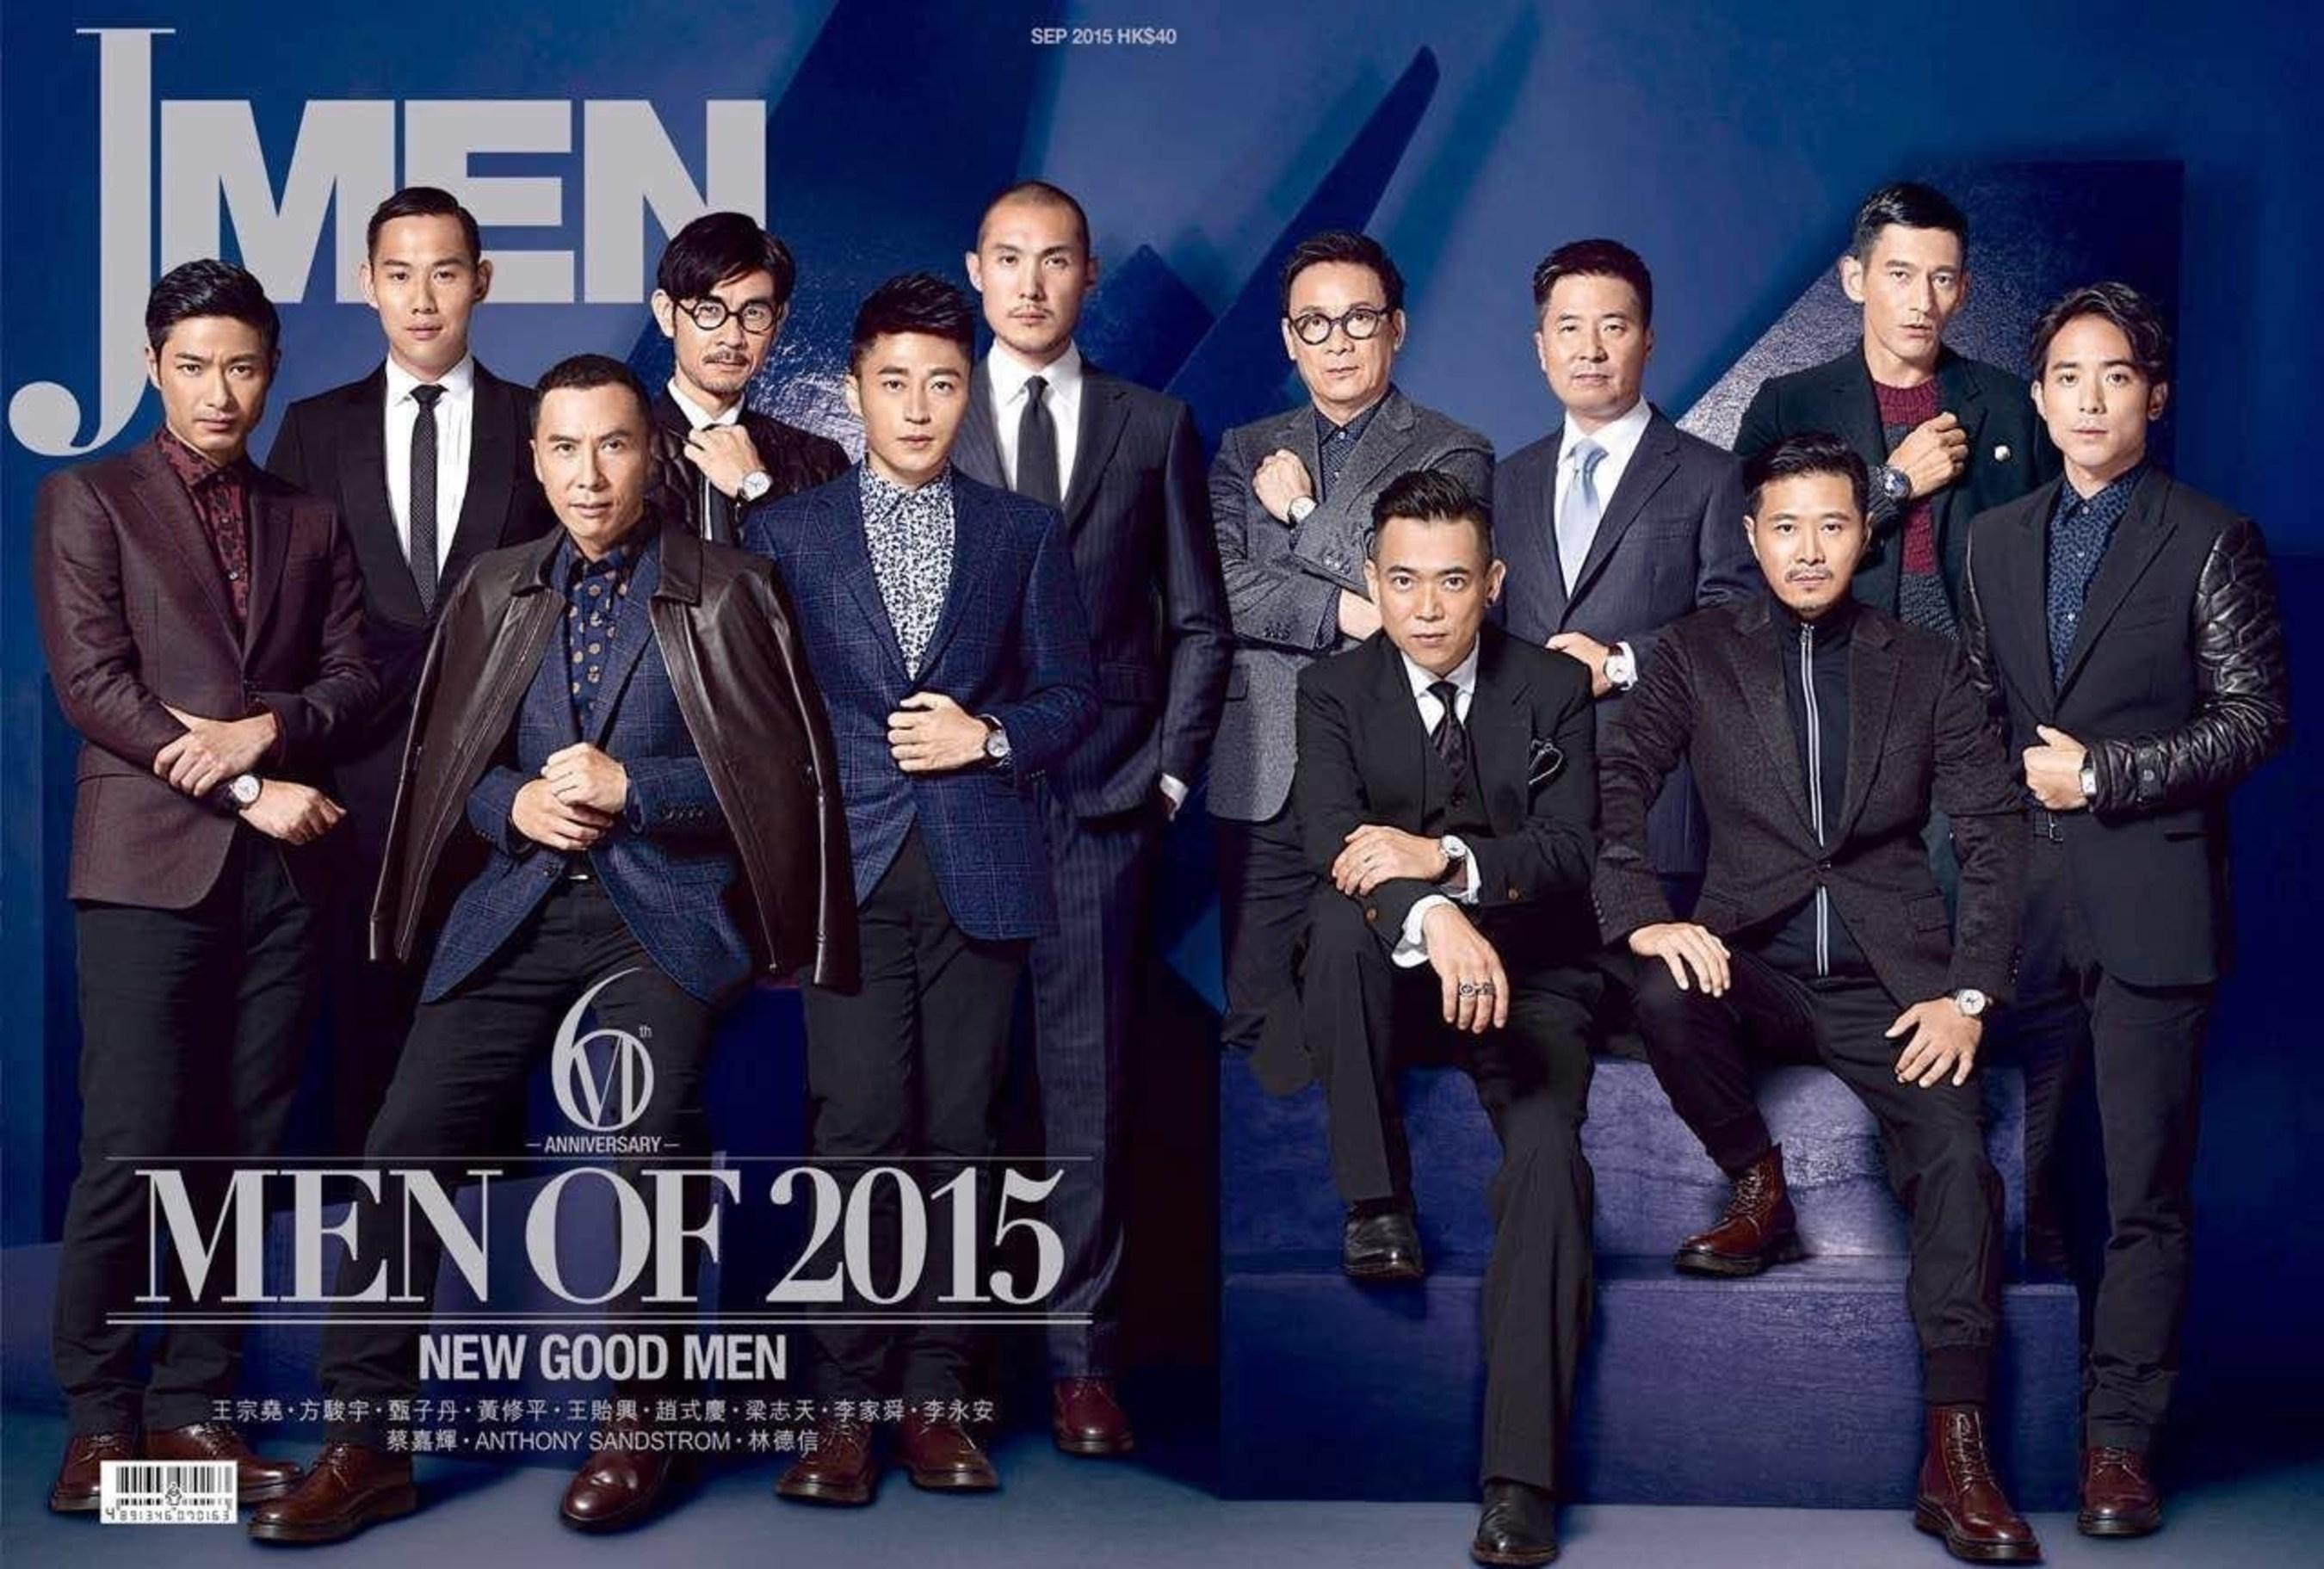 Saatchi & Saatchi's Michael Lee Awarded Amongst JMEN's 'Men of the Year 2015'